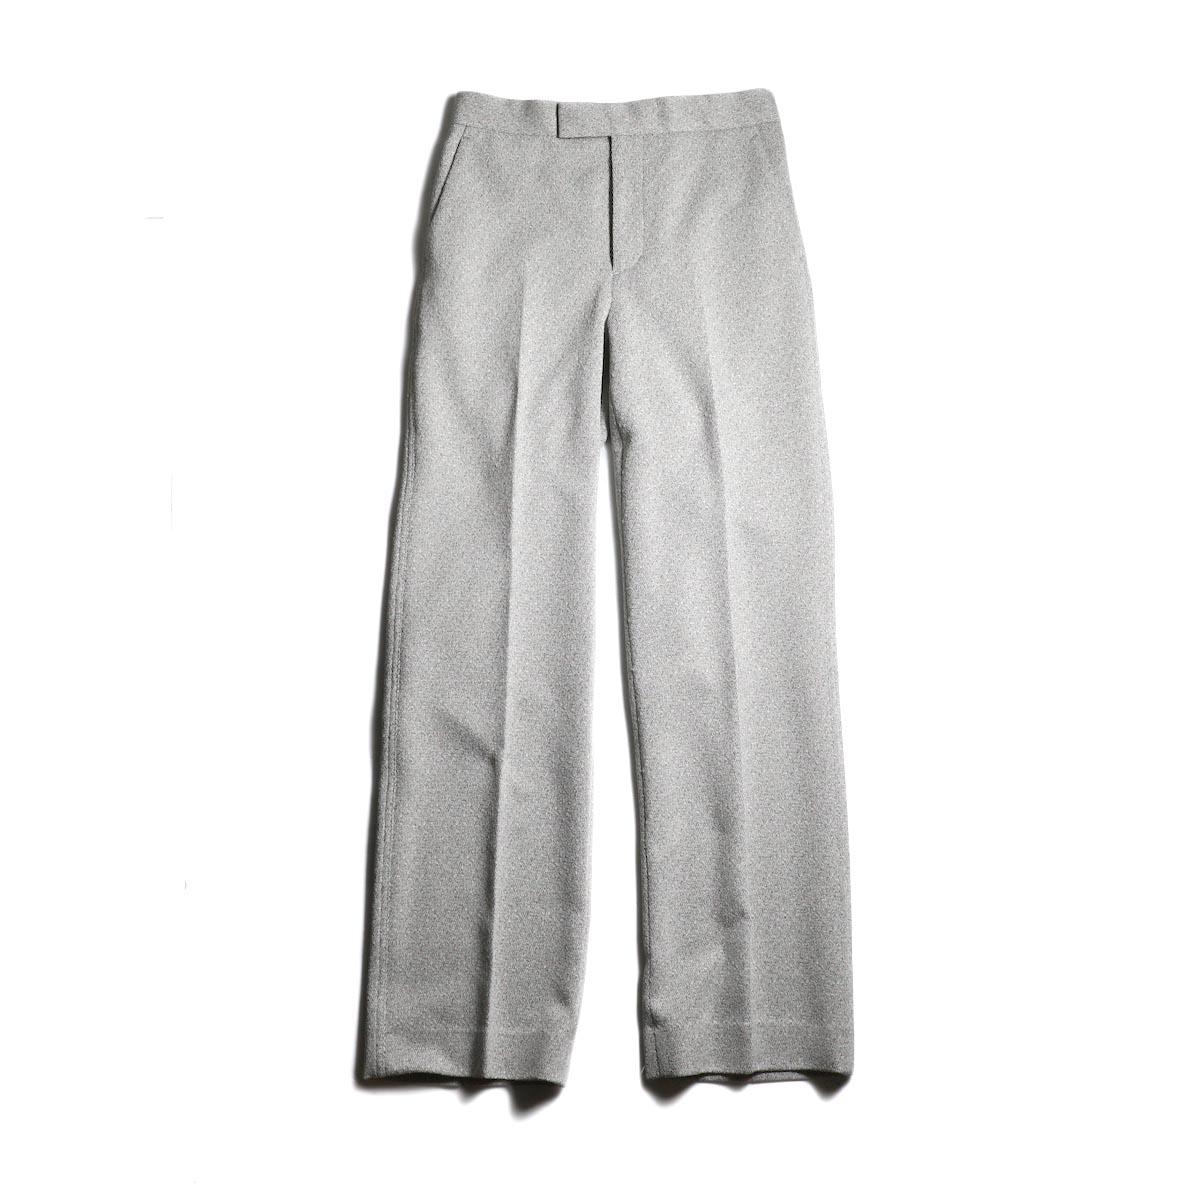 FUMIKA UCHIDA / Poli Tweed Straight Slacks -L.Gray